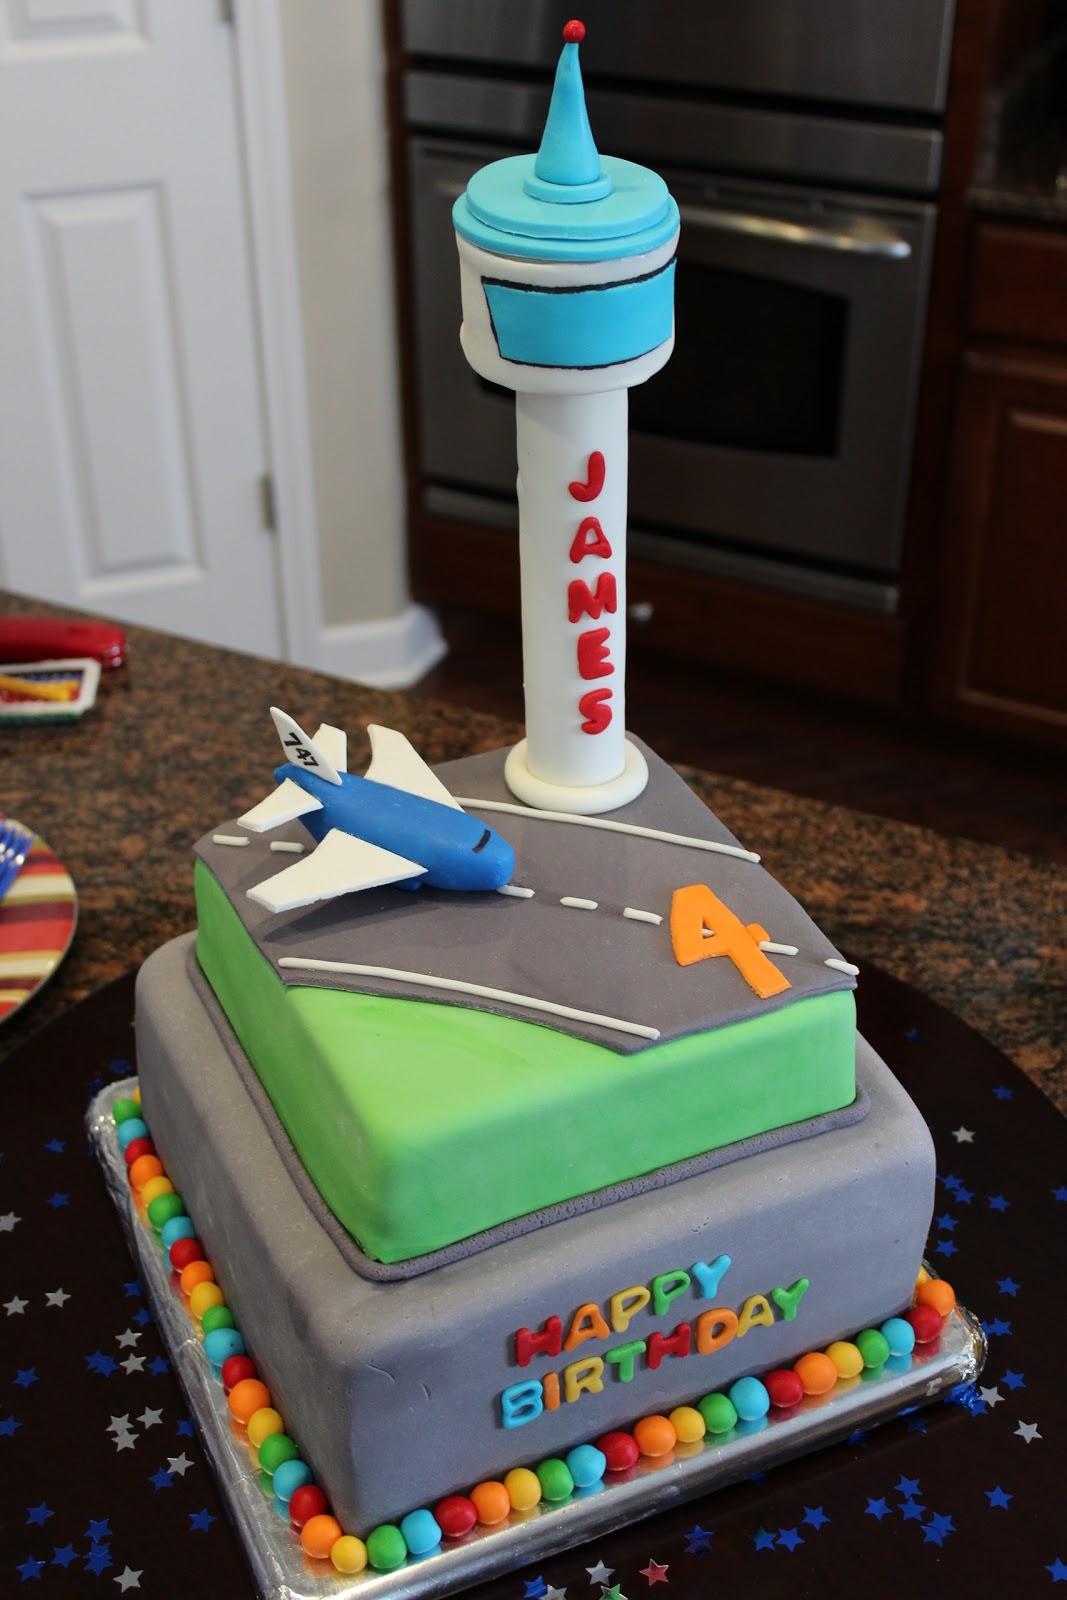 Cake Flair Airplane Airport Cake